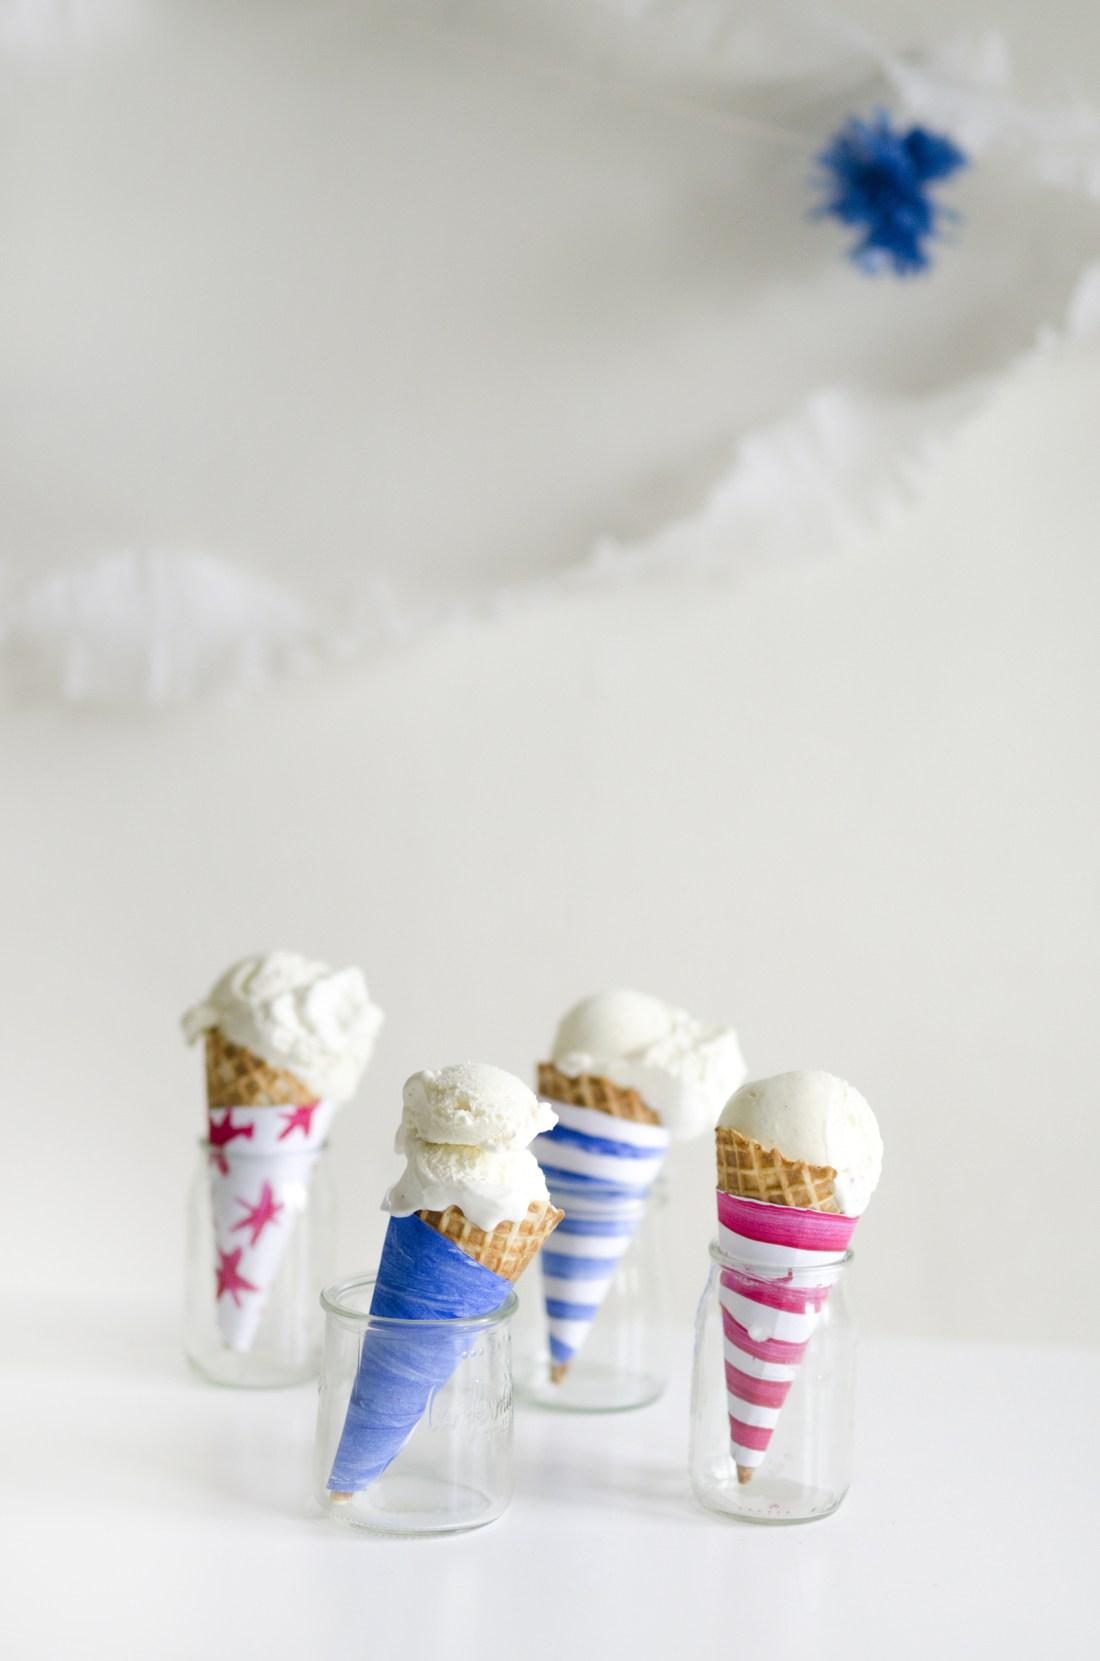 MAIN_Ice Cream Wrappers_INTRO